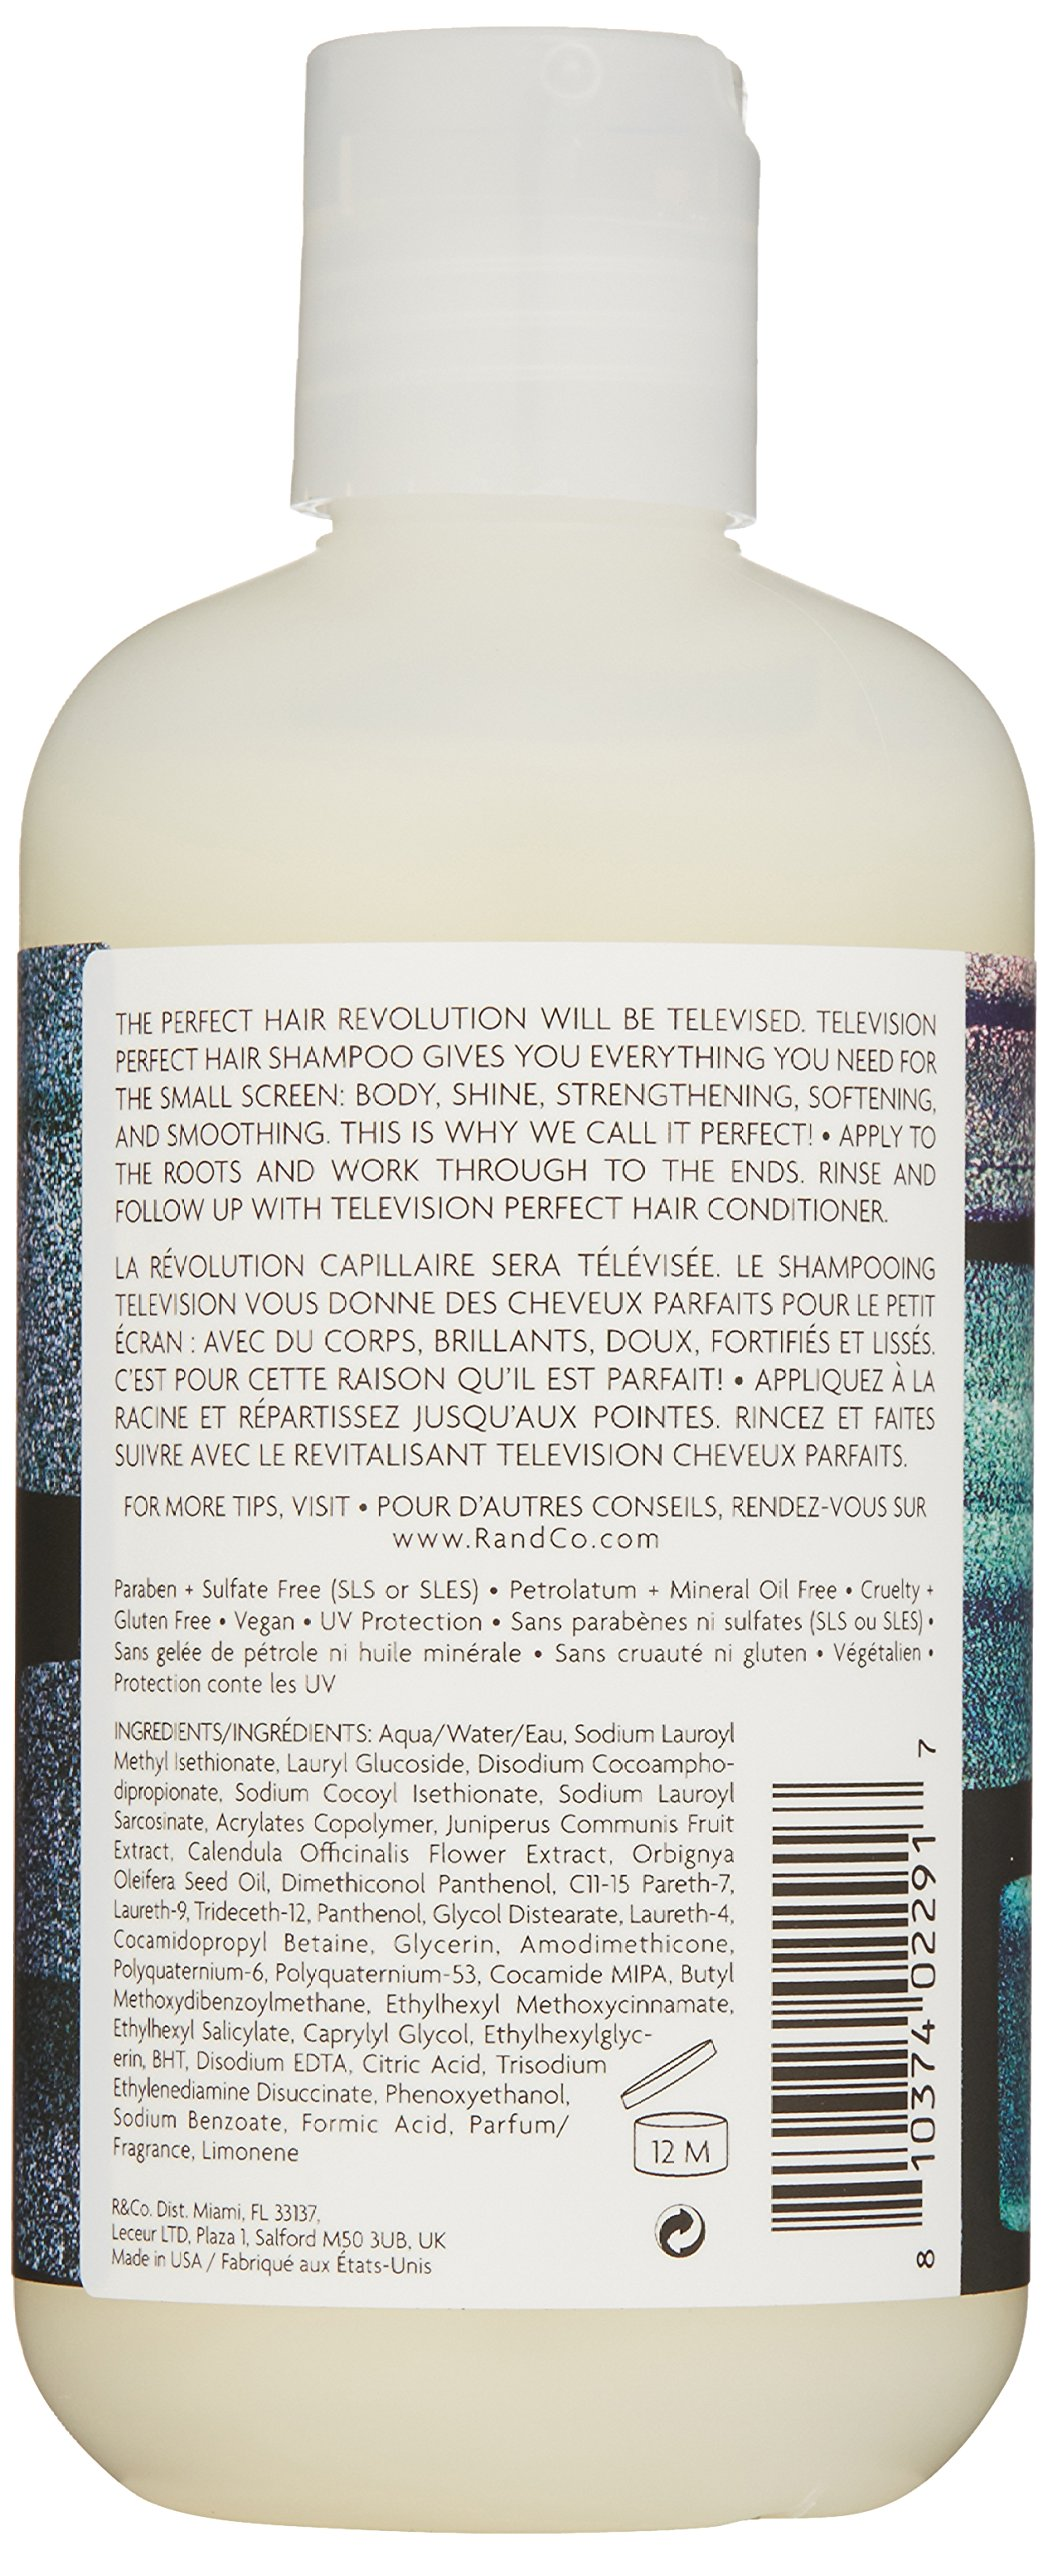 R+Co Television Perfect Hair Shampoo, 8 fl. oz. by R+Co (Image #2)